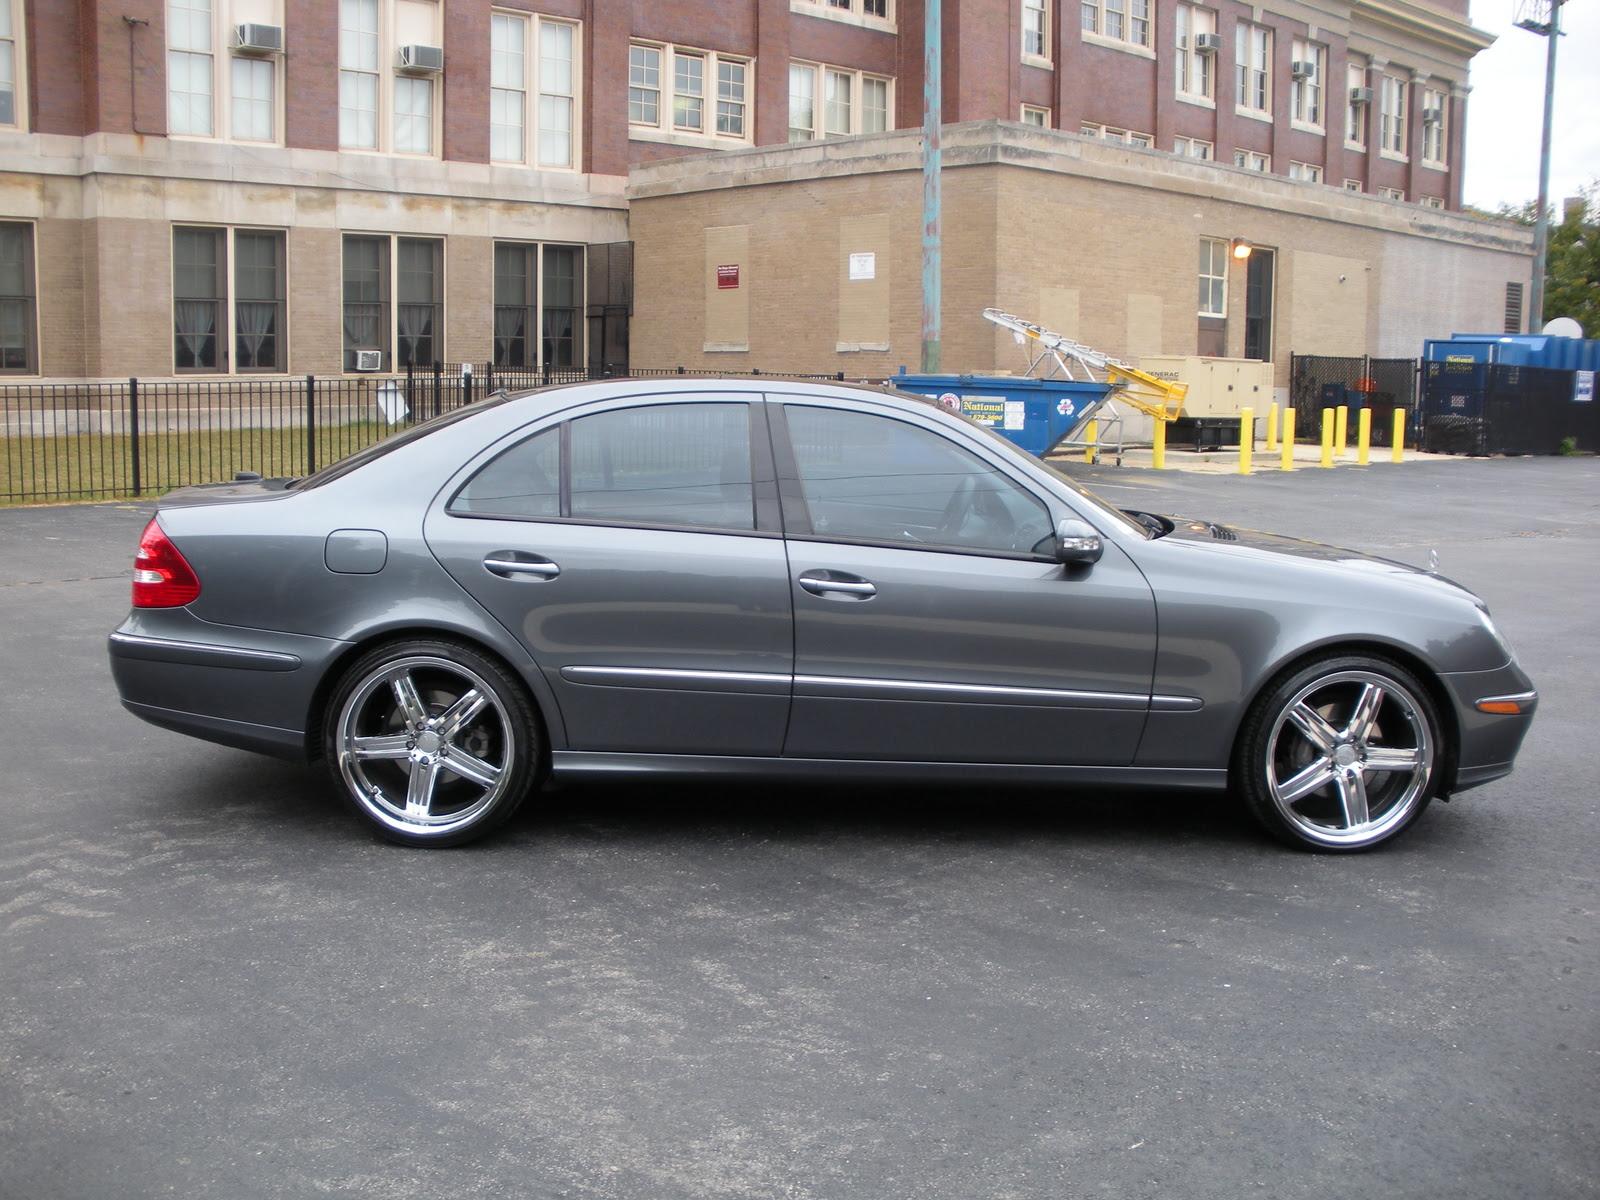 2005 Mercedes-Benz E-Class - Exterior Pictures - CarGurus